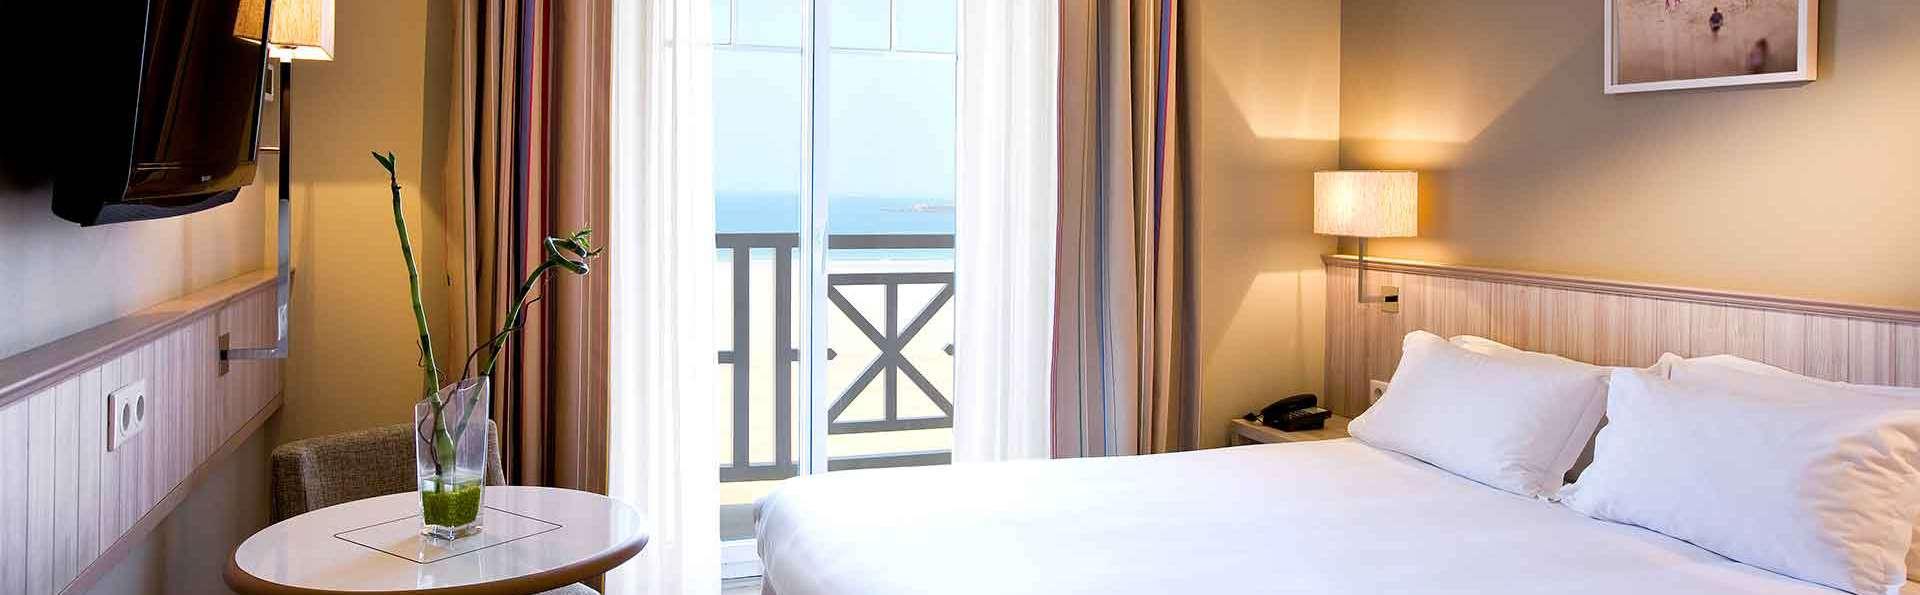 H tel antin a 3 saint malo france for Hotel saint malo jacuzzi chambre